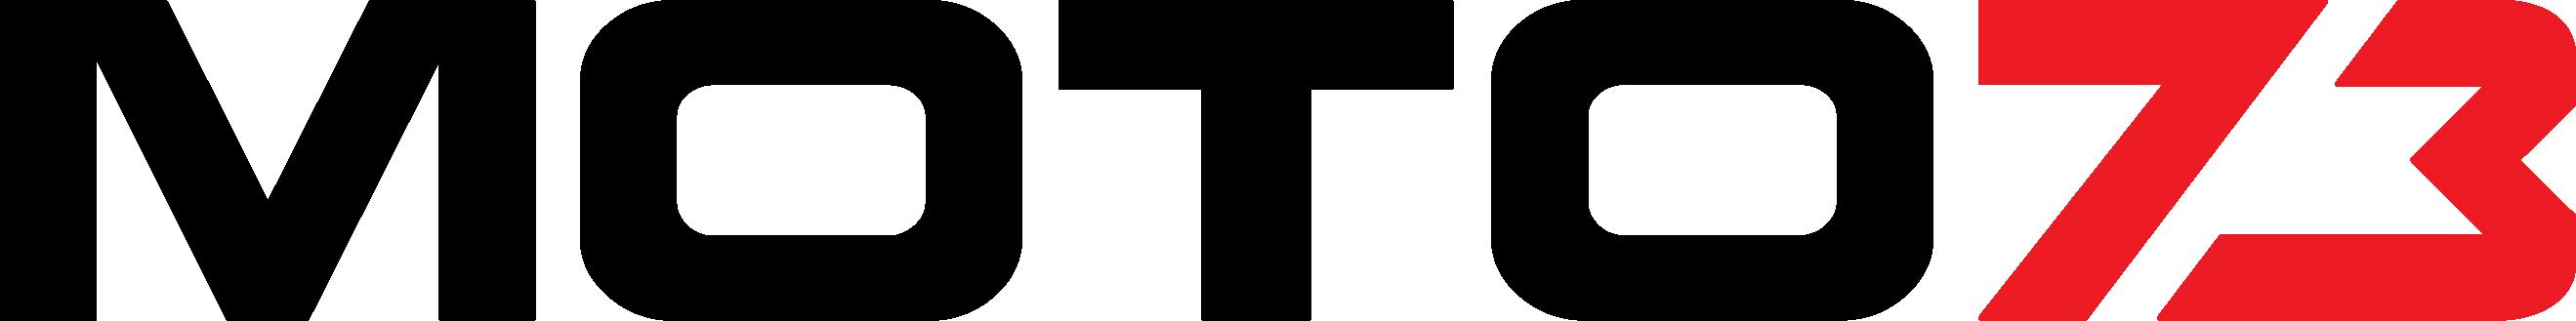 Moto73_logo_NSM